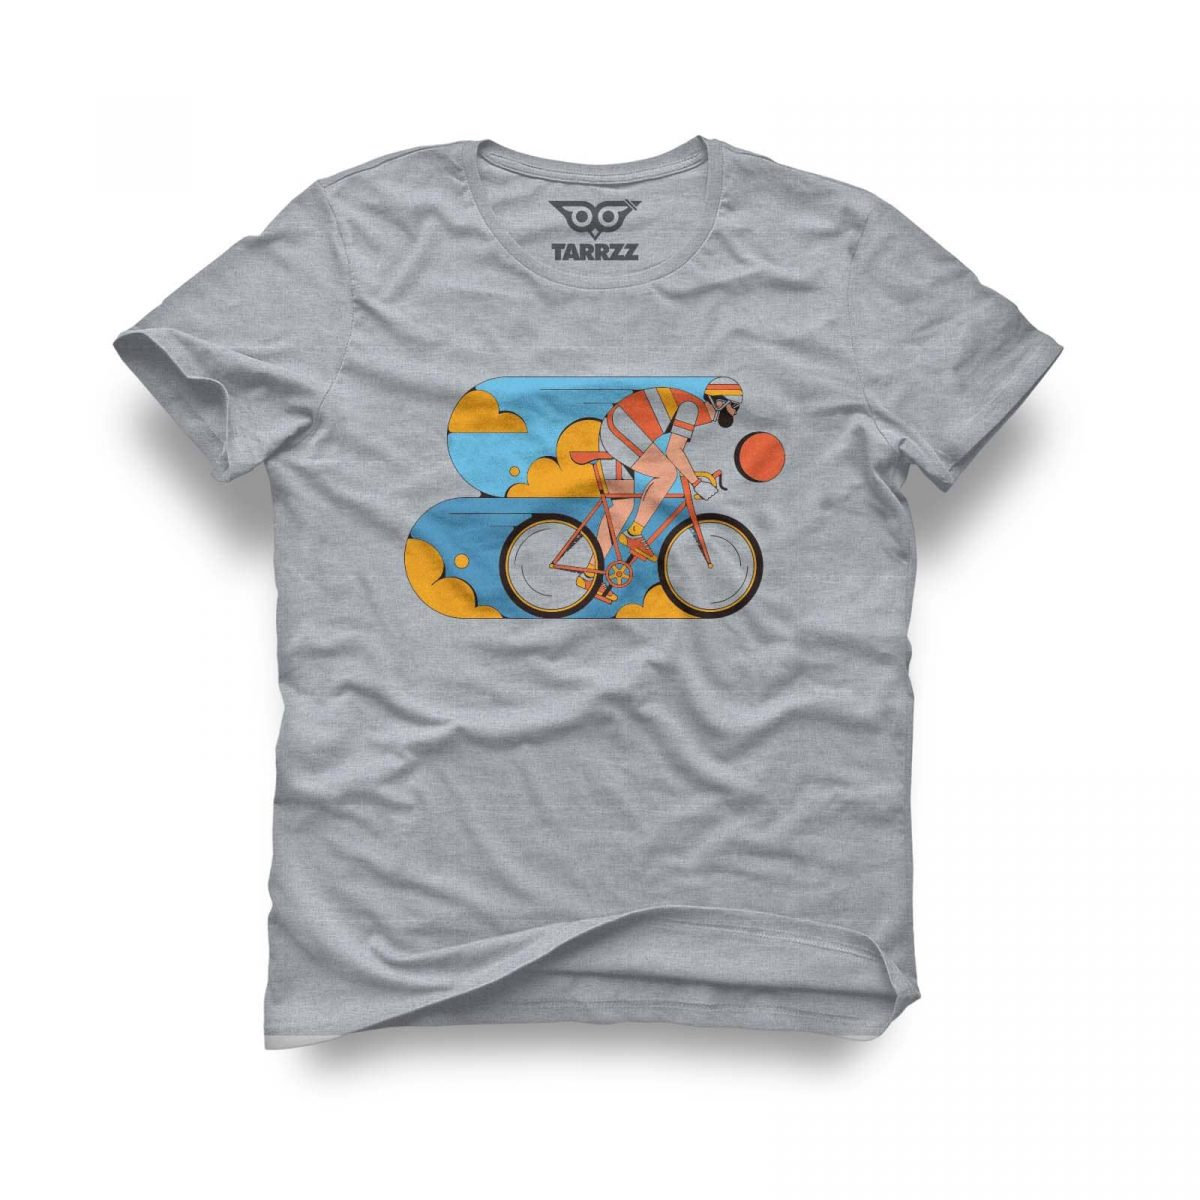 tarrzz-tasarim-gri-tisort-bisikletci